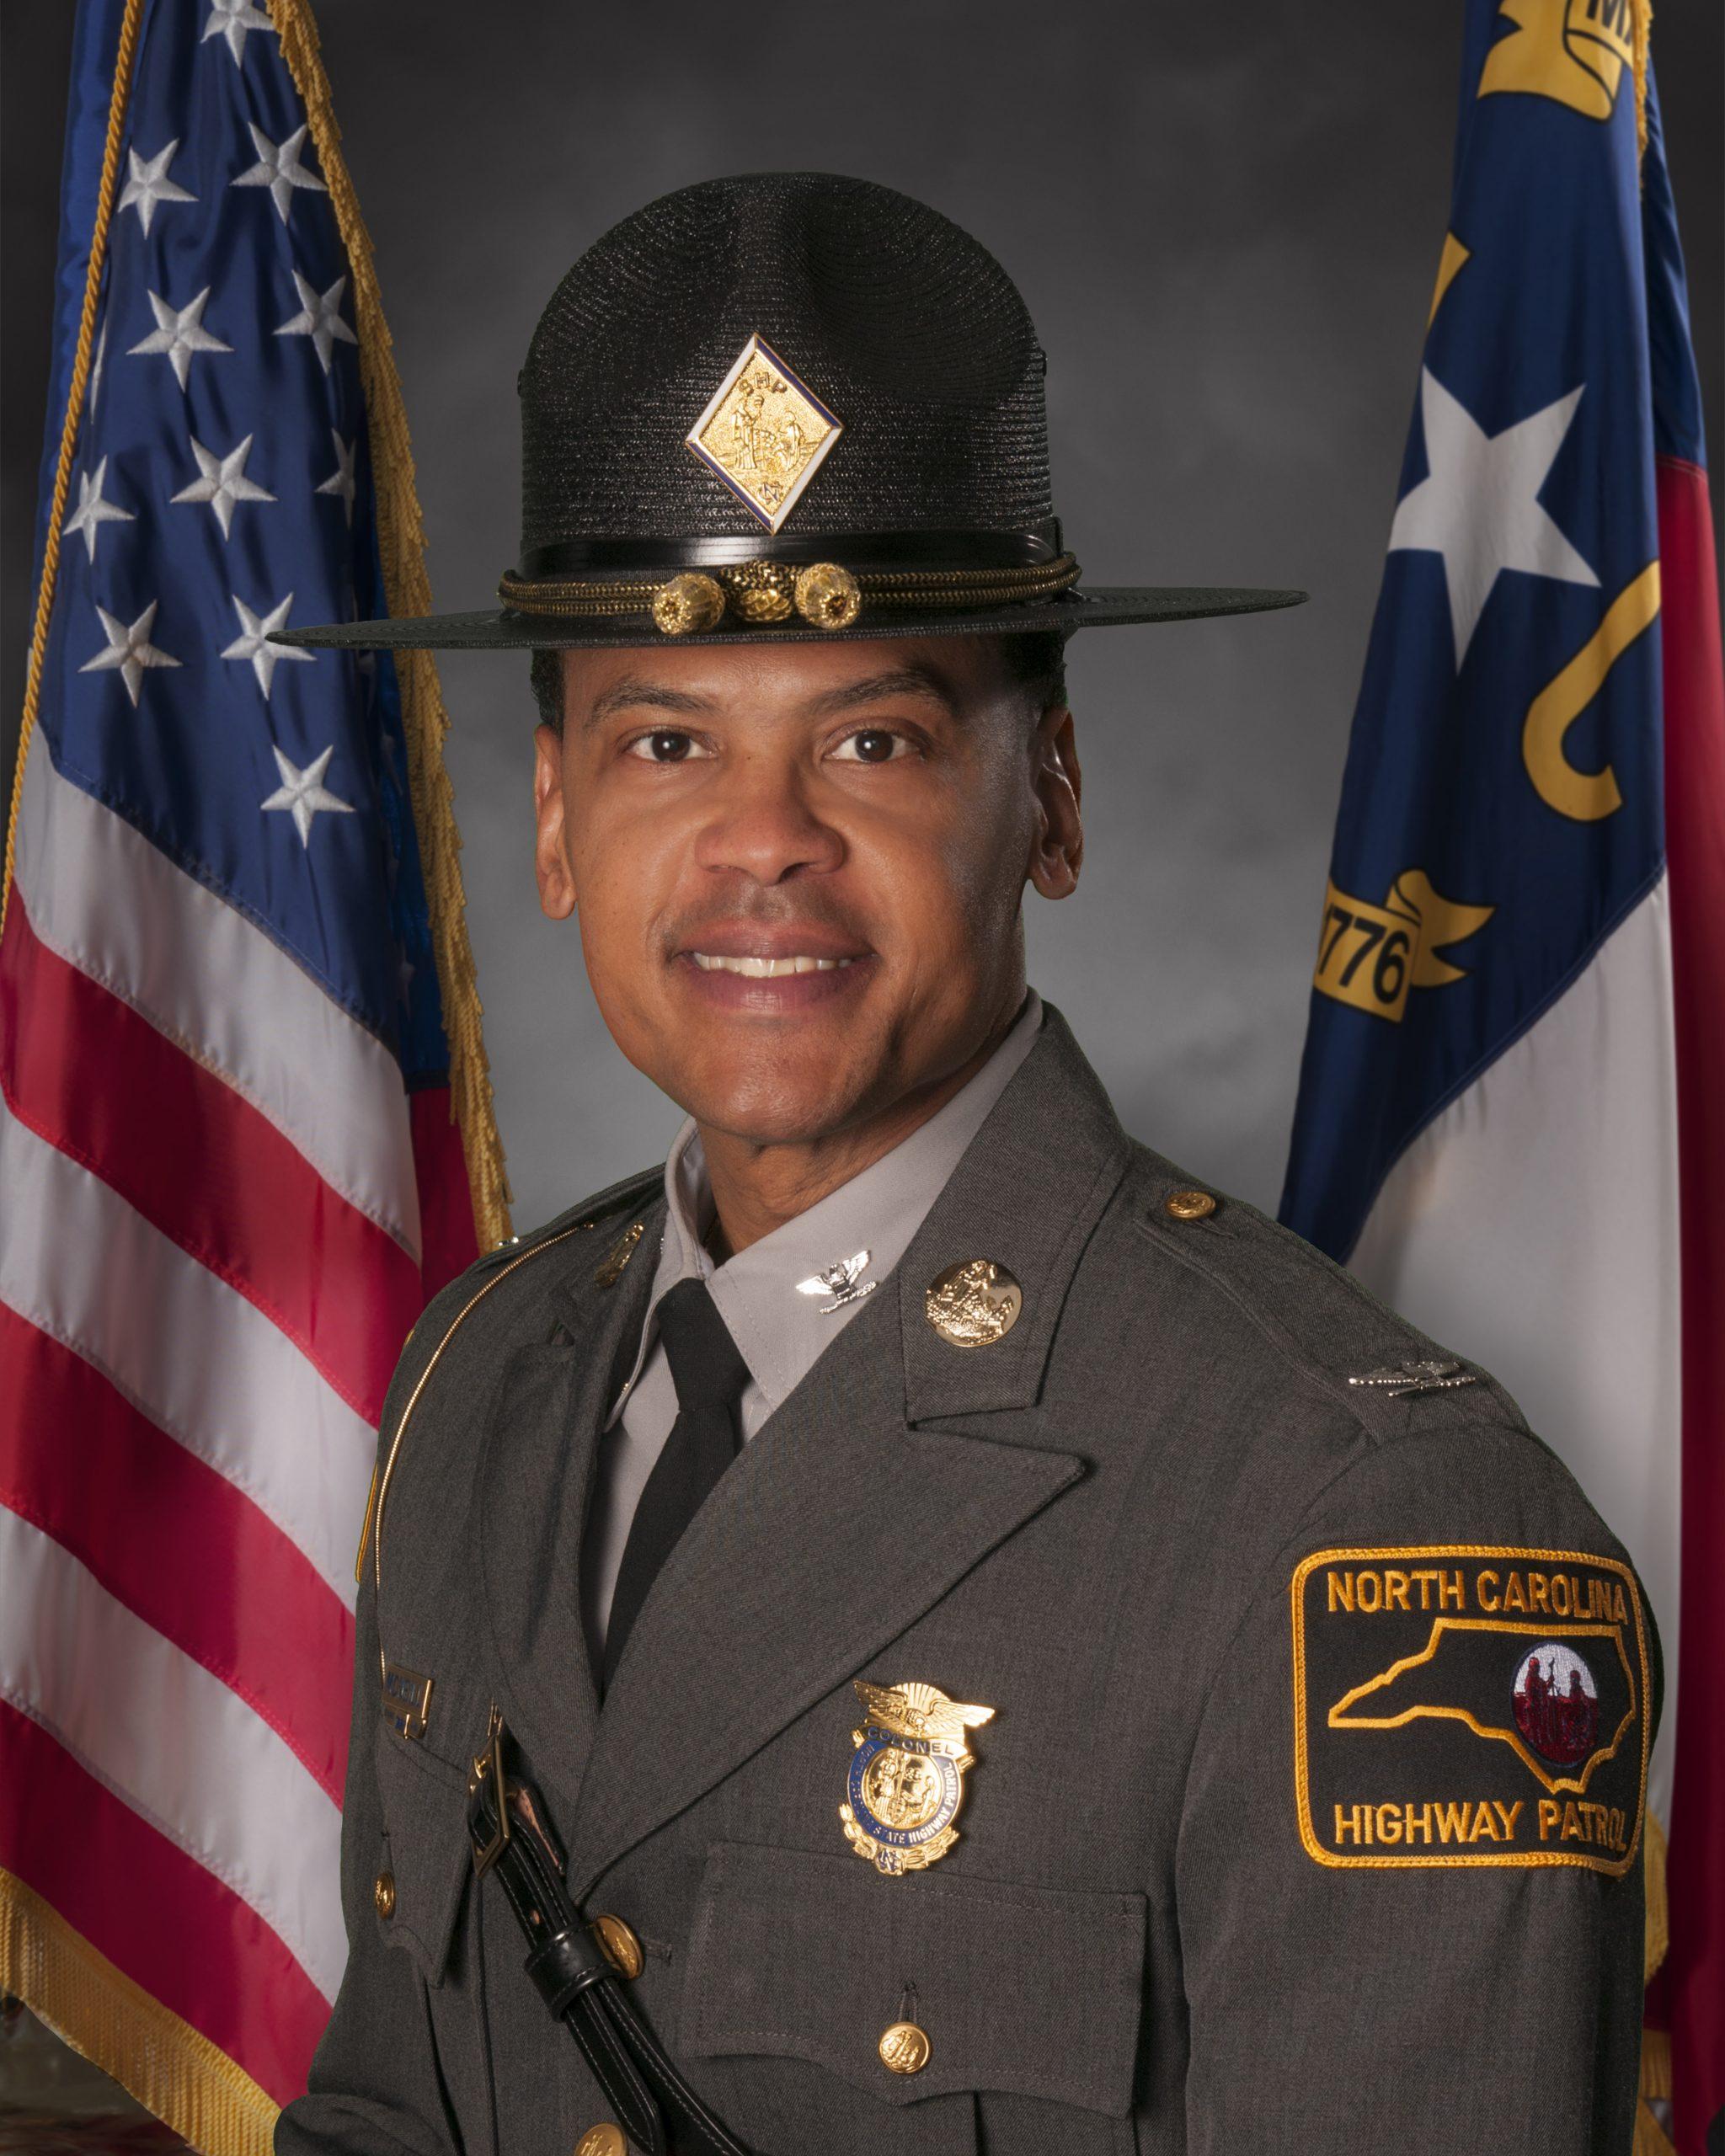 UMO Alumnus Glenn M. McNeill, Jr. Shares Insights  as Commander of the North Carolina State Highway Patrol